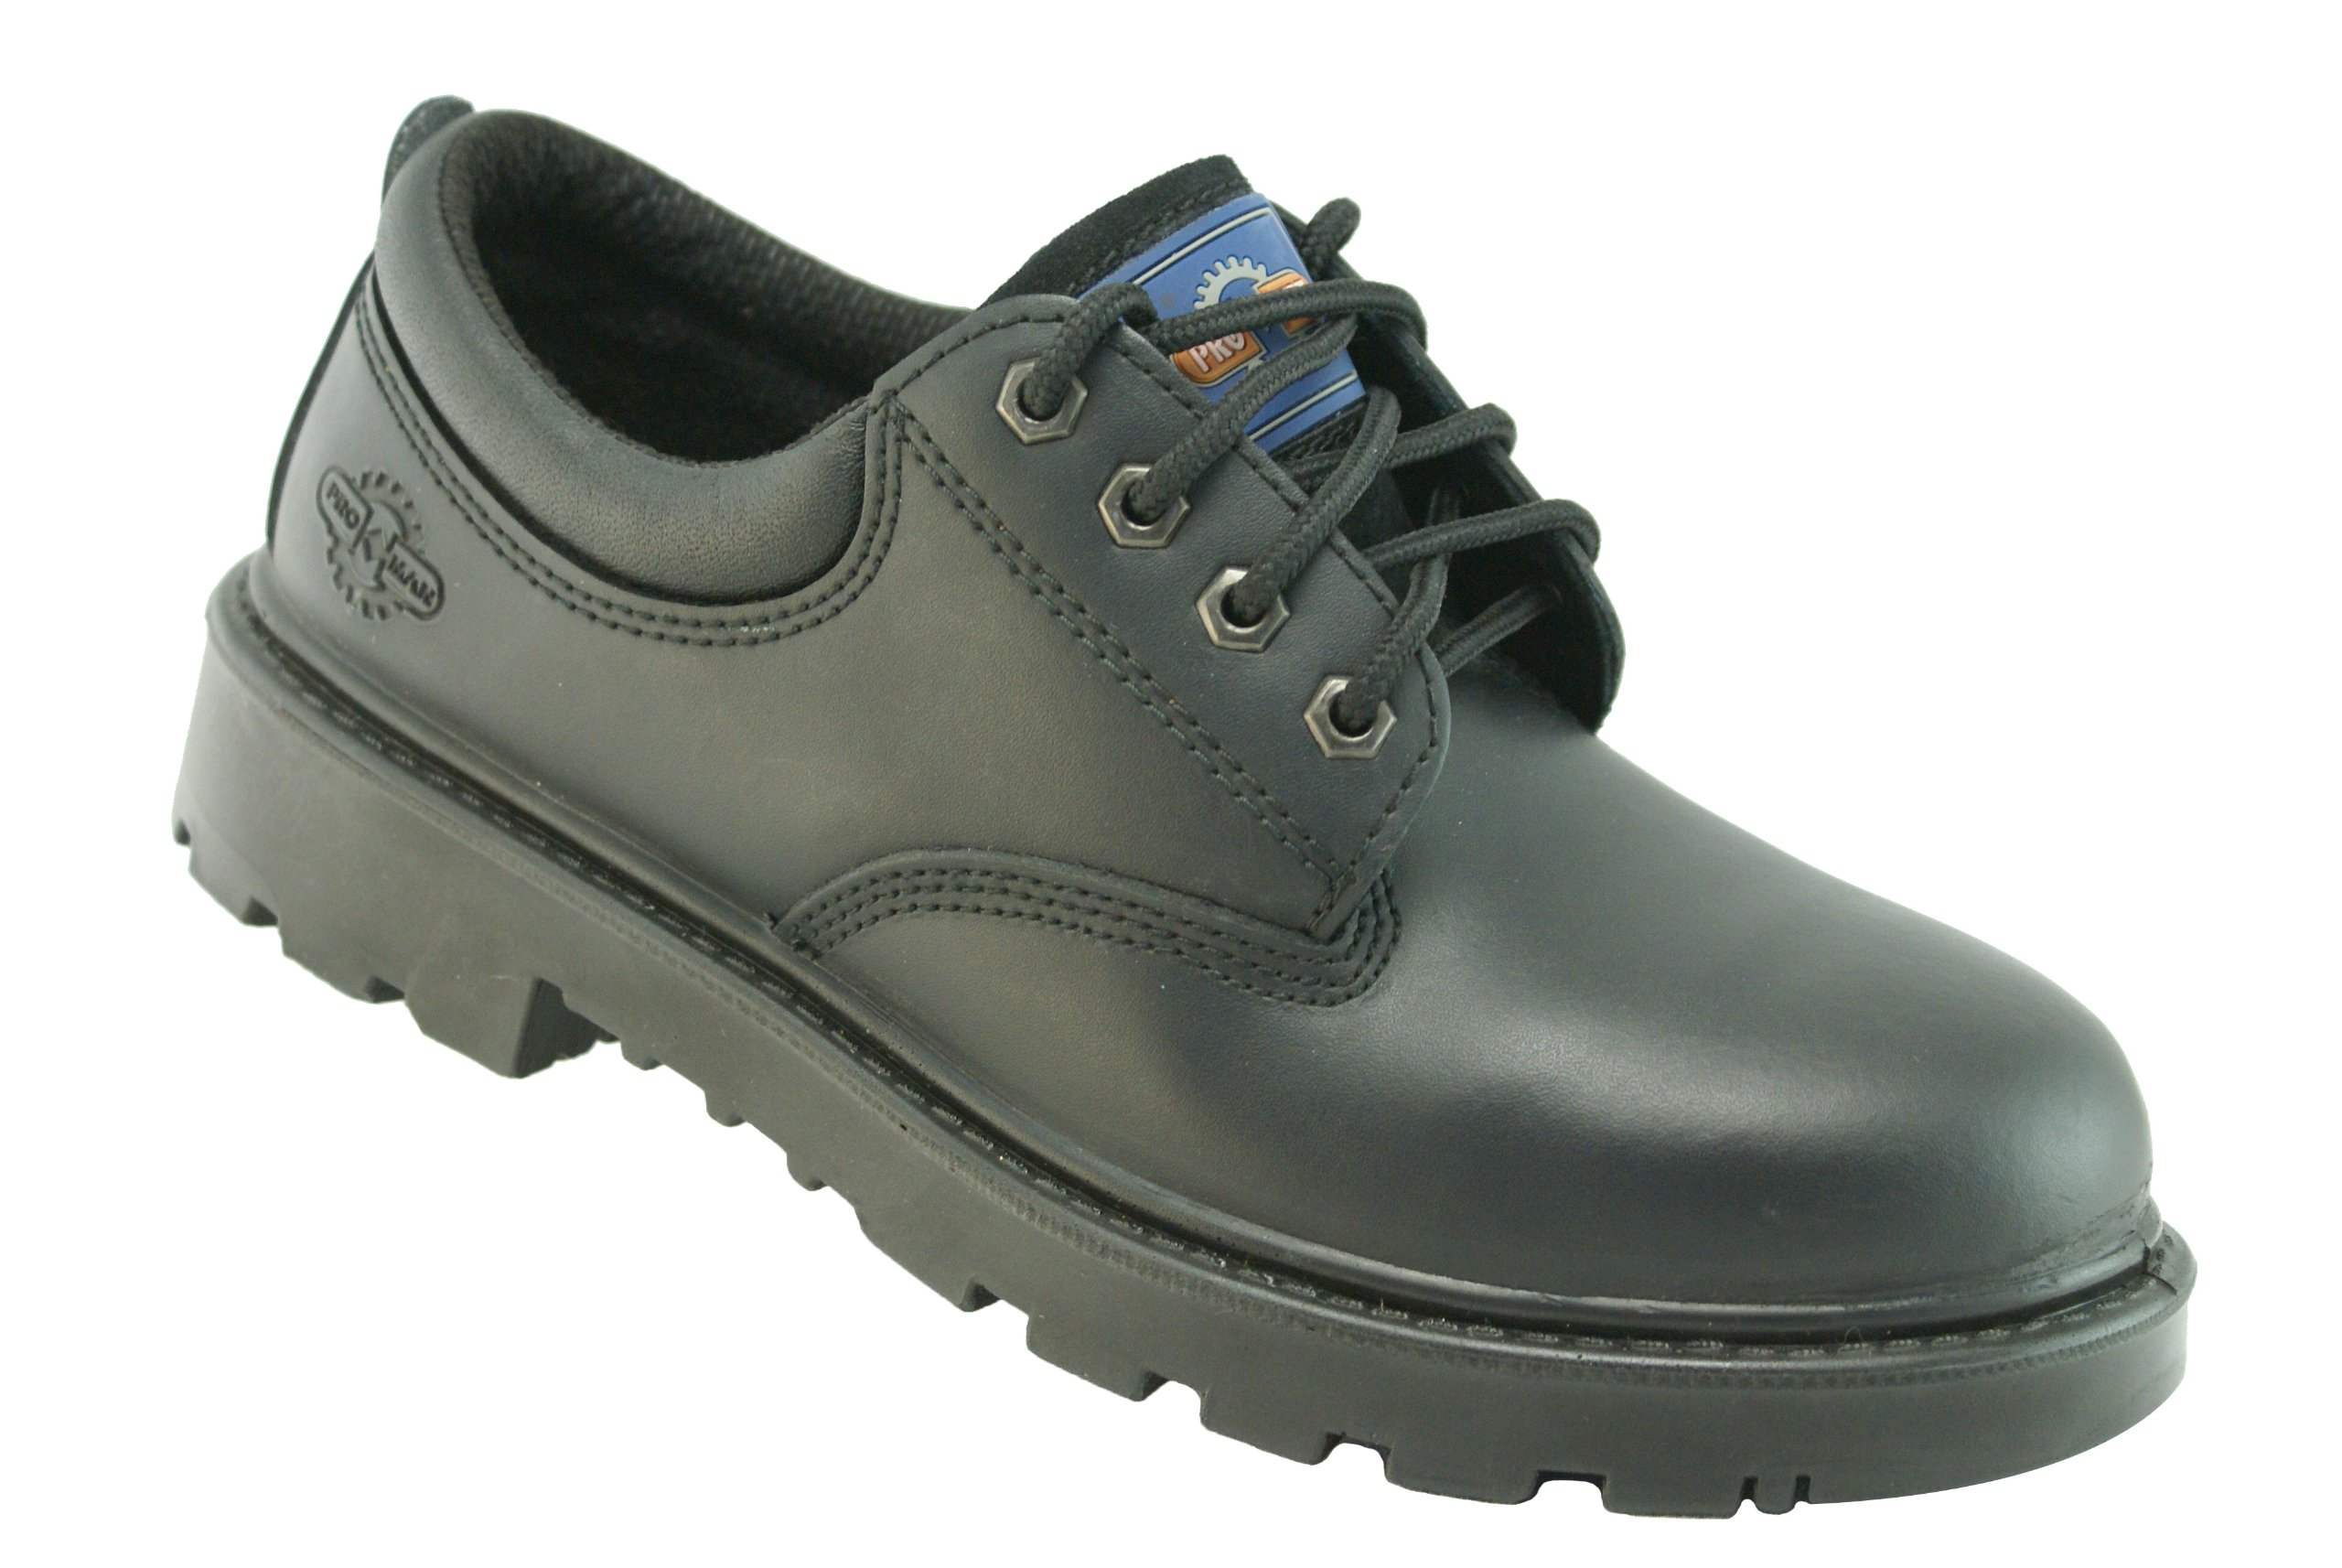 Pro-Man Men's S3 Leather Steel Toe Cap Safety & Work Shoes US Size 13 Black